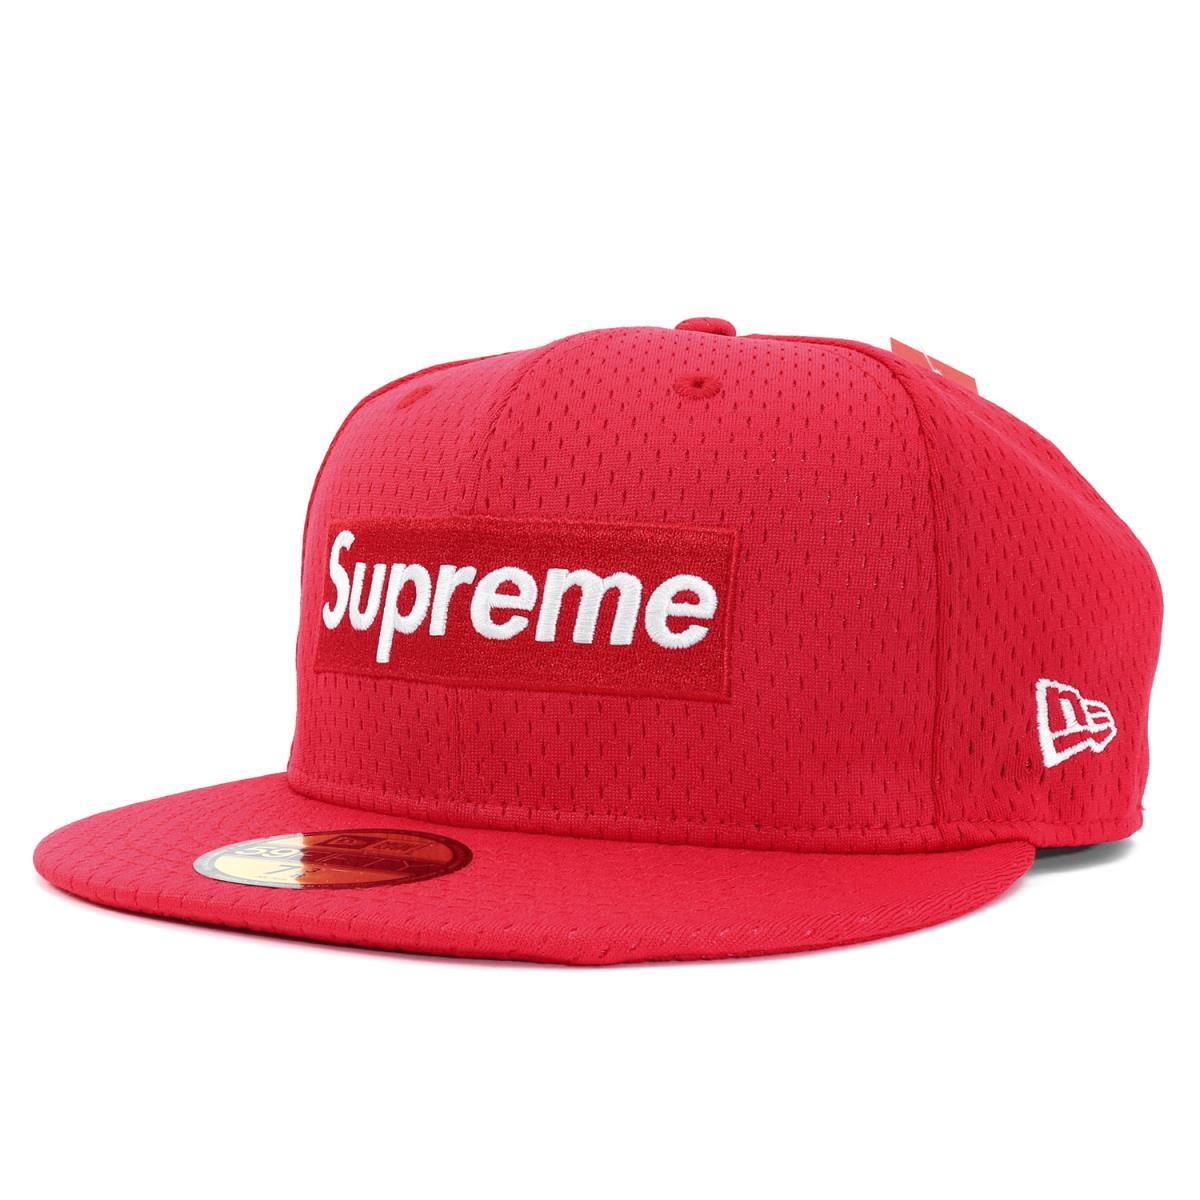 99ec0d9a Supreme (シュプリーム) 18S/S X NEW ERA BOX logo mesh baseball cap (Mesh ...